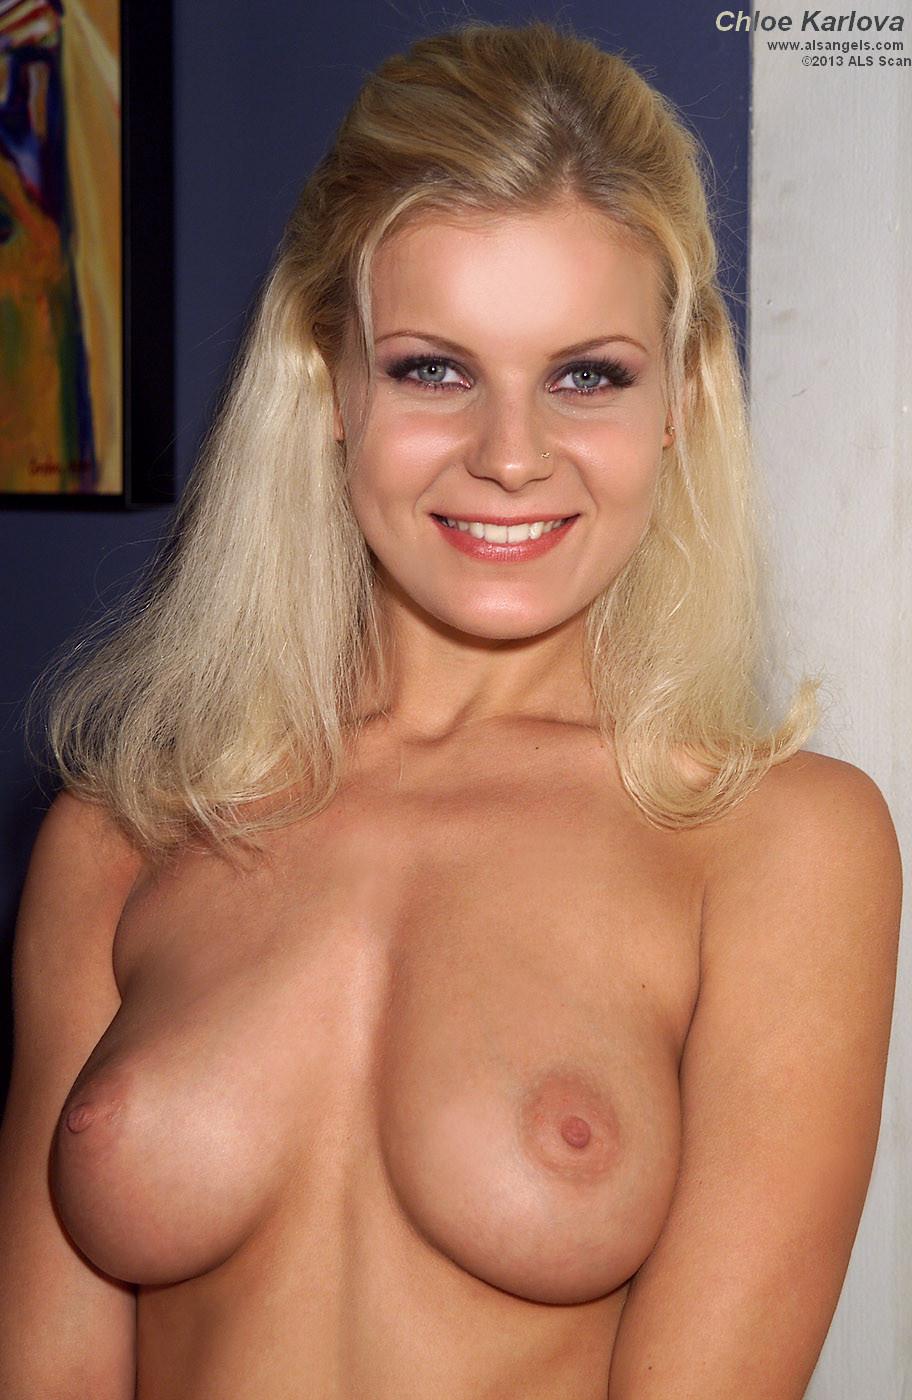 Chloe Karlova порно модель